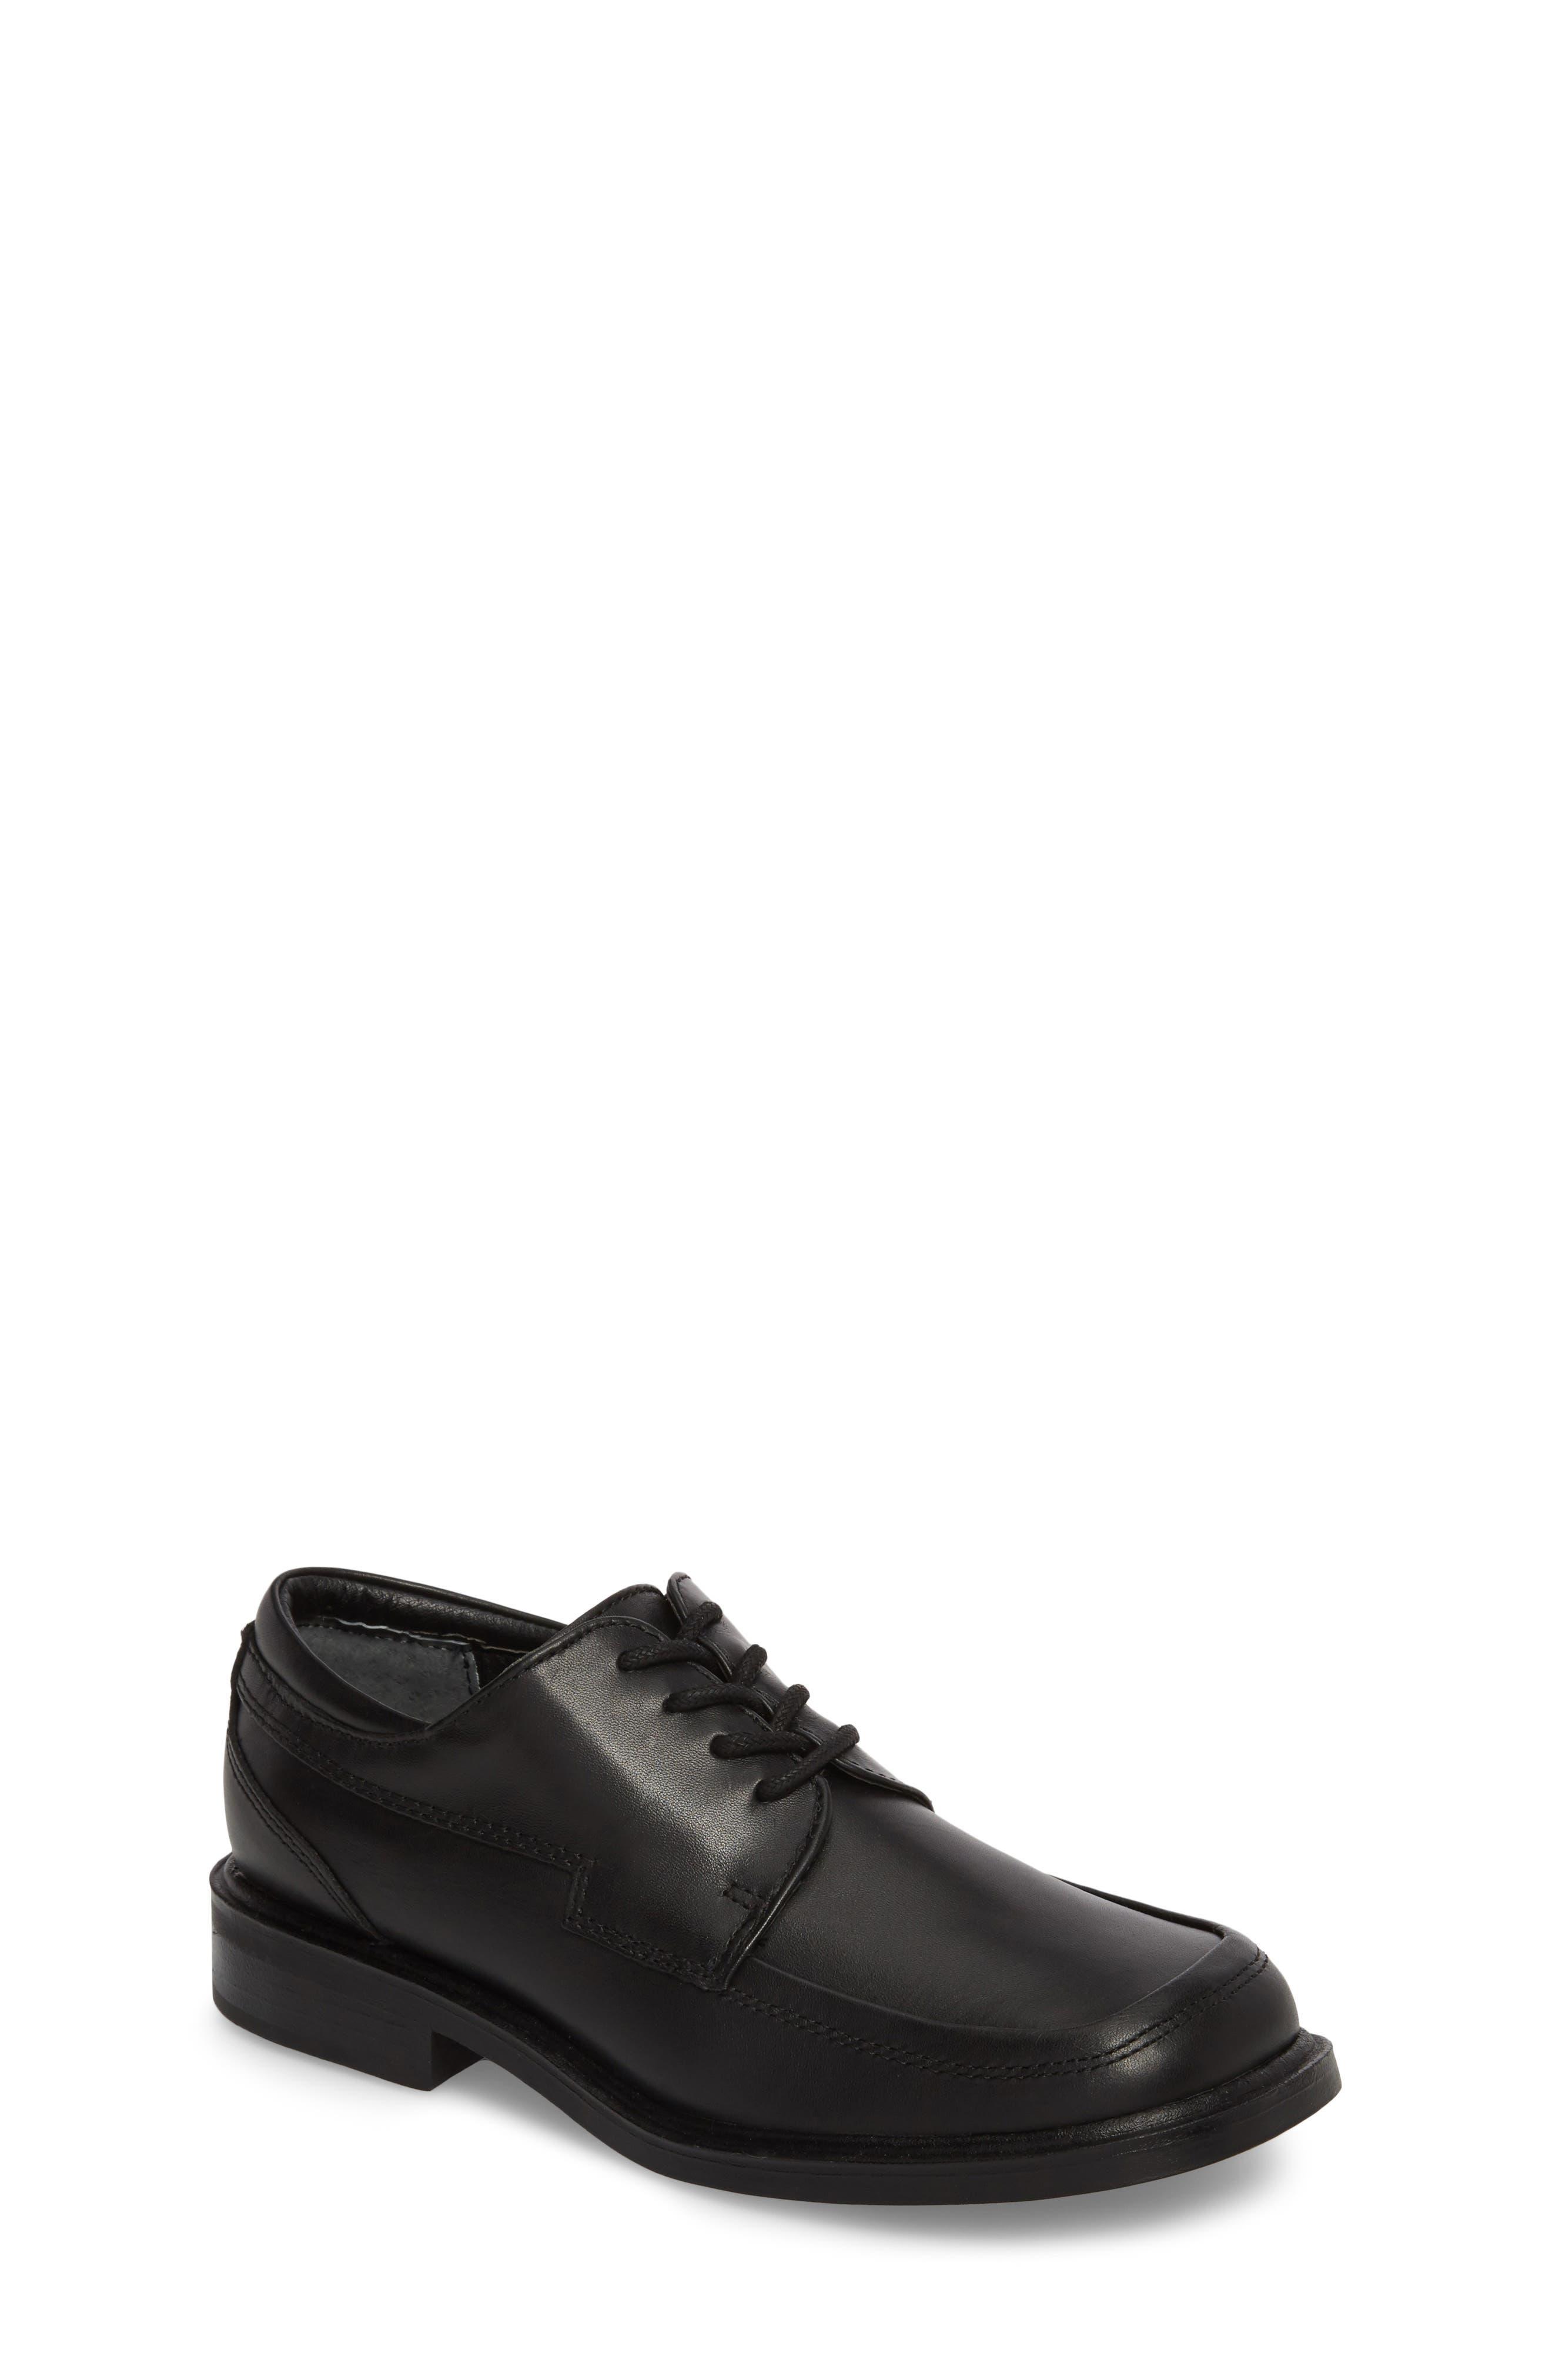 Reaction Kenneth Cole 'T-Flex Senior' Oxford,                             Main thumbnail 1, color,                             Black/ Black Leather